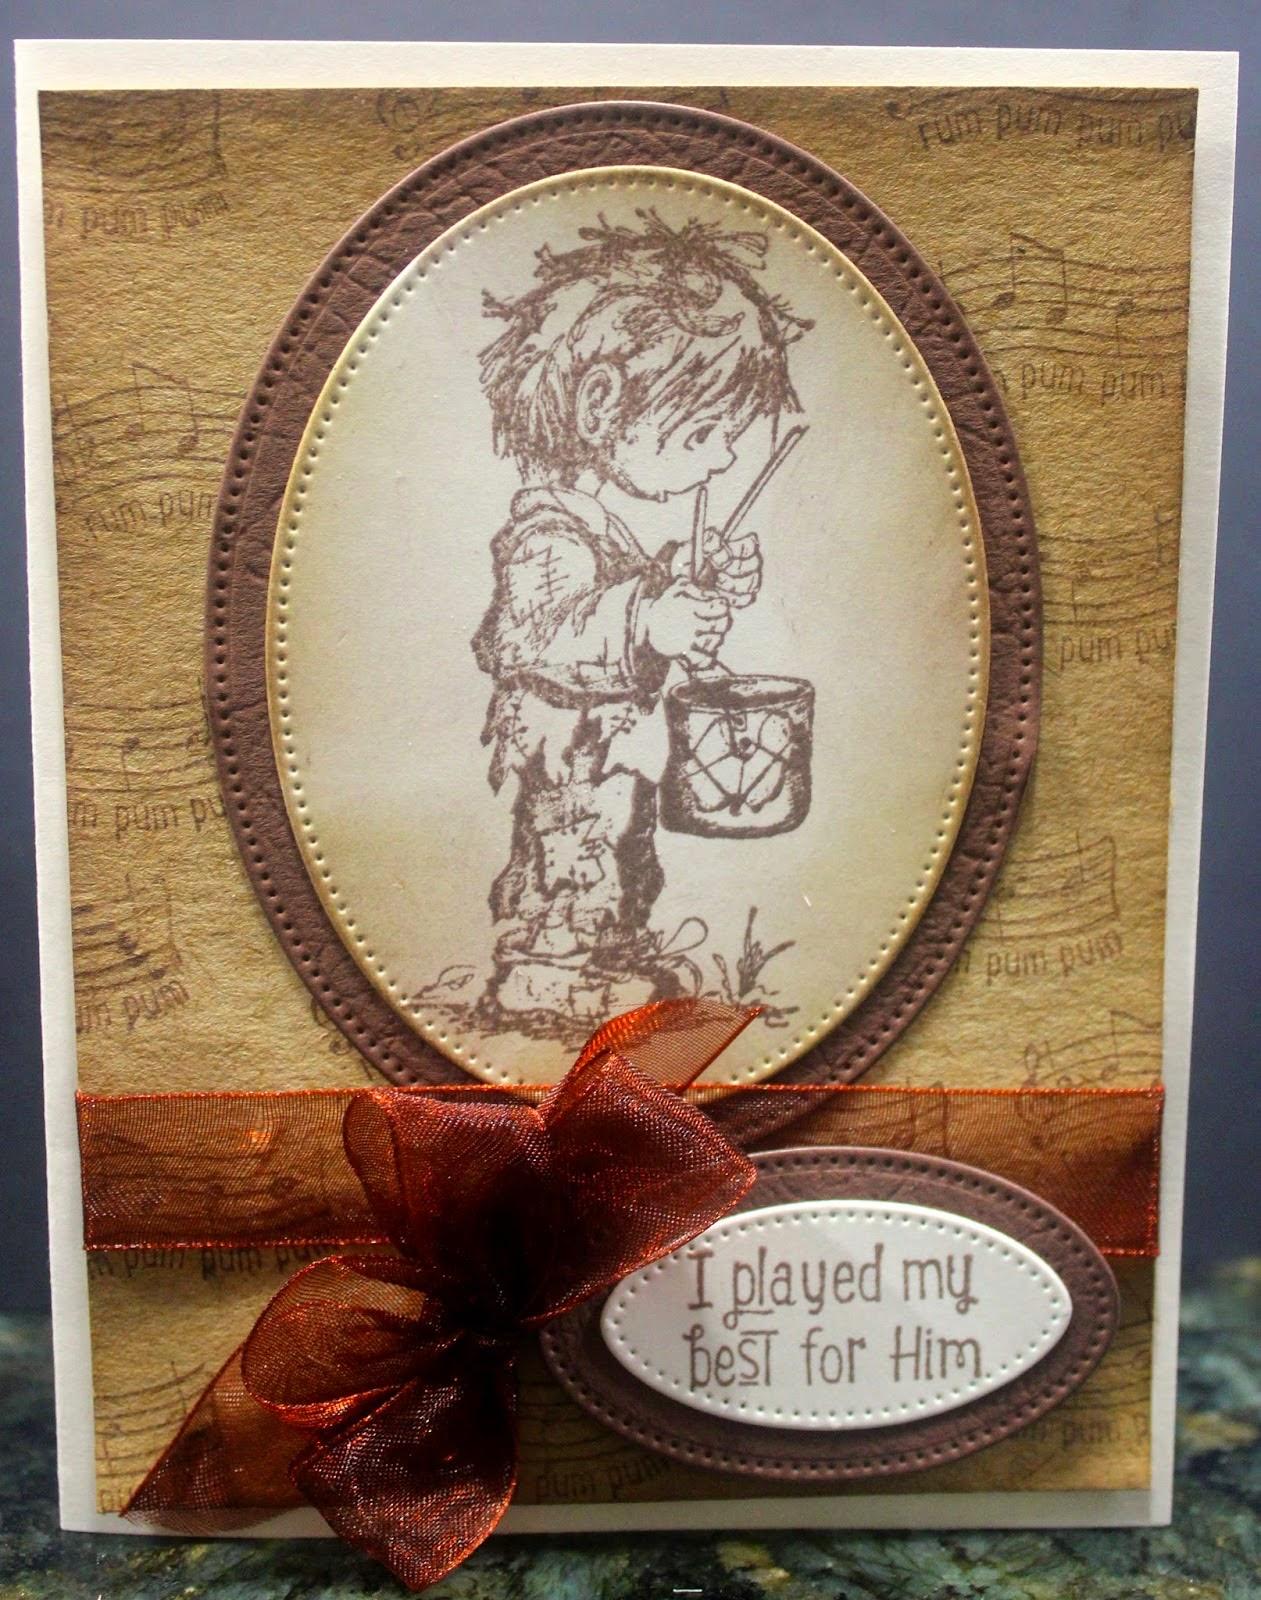 ODBD Little Drummer Boy, ODBD Customer Card of the Day by Rita Kegg